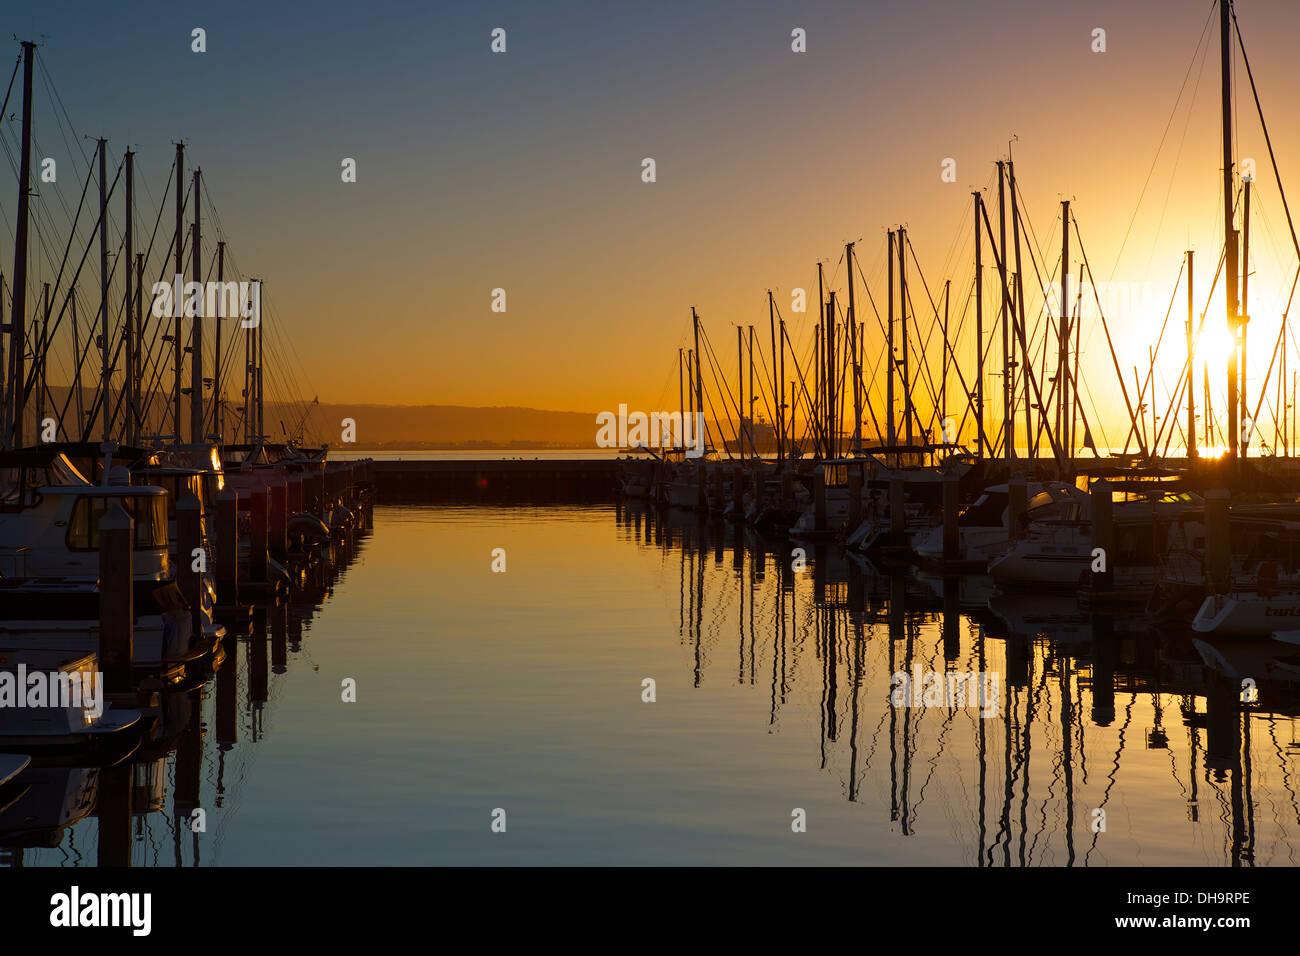 Sunrise at The South Beach Marina, San Francisco Stock Photo